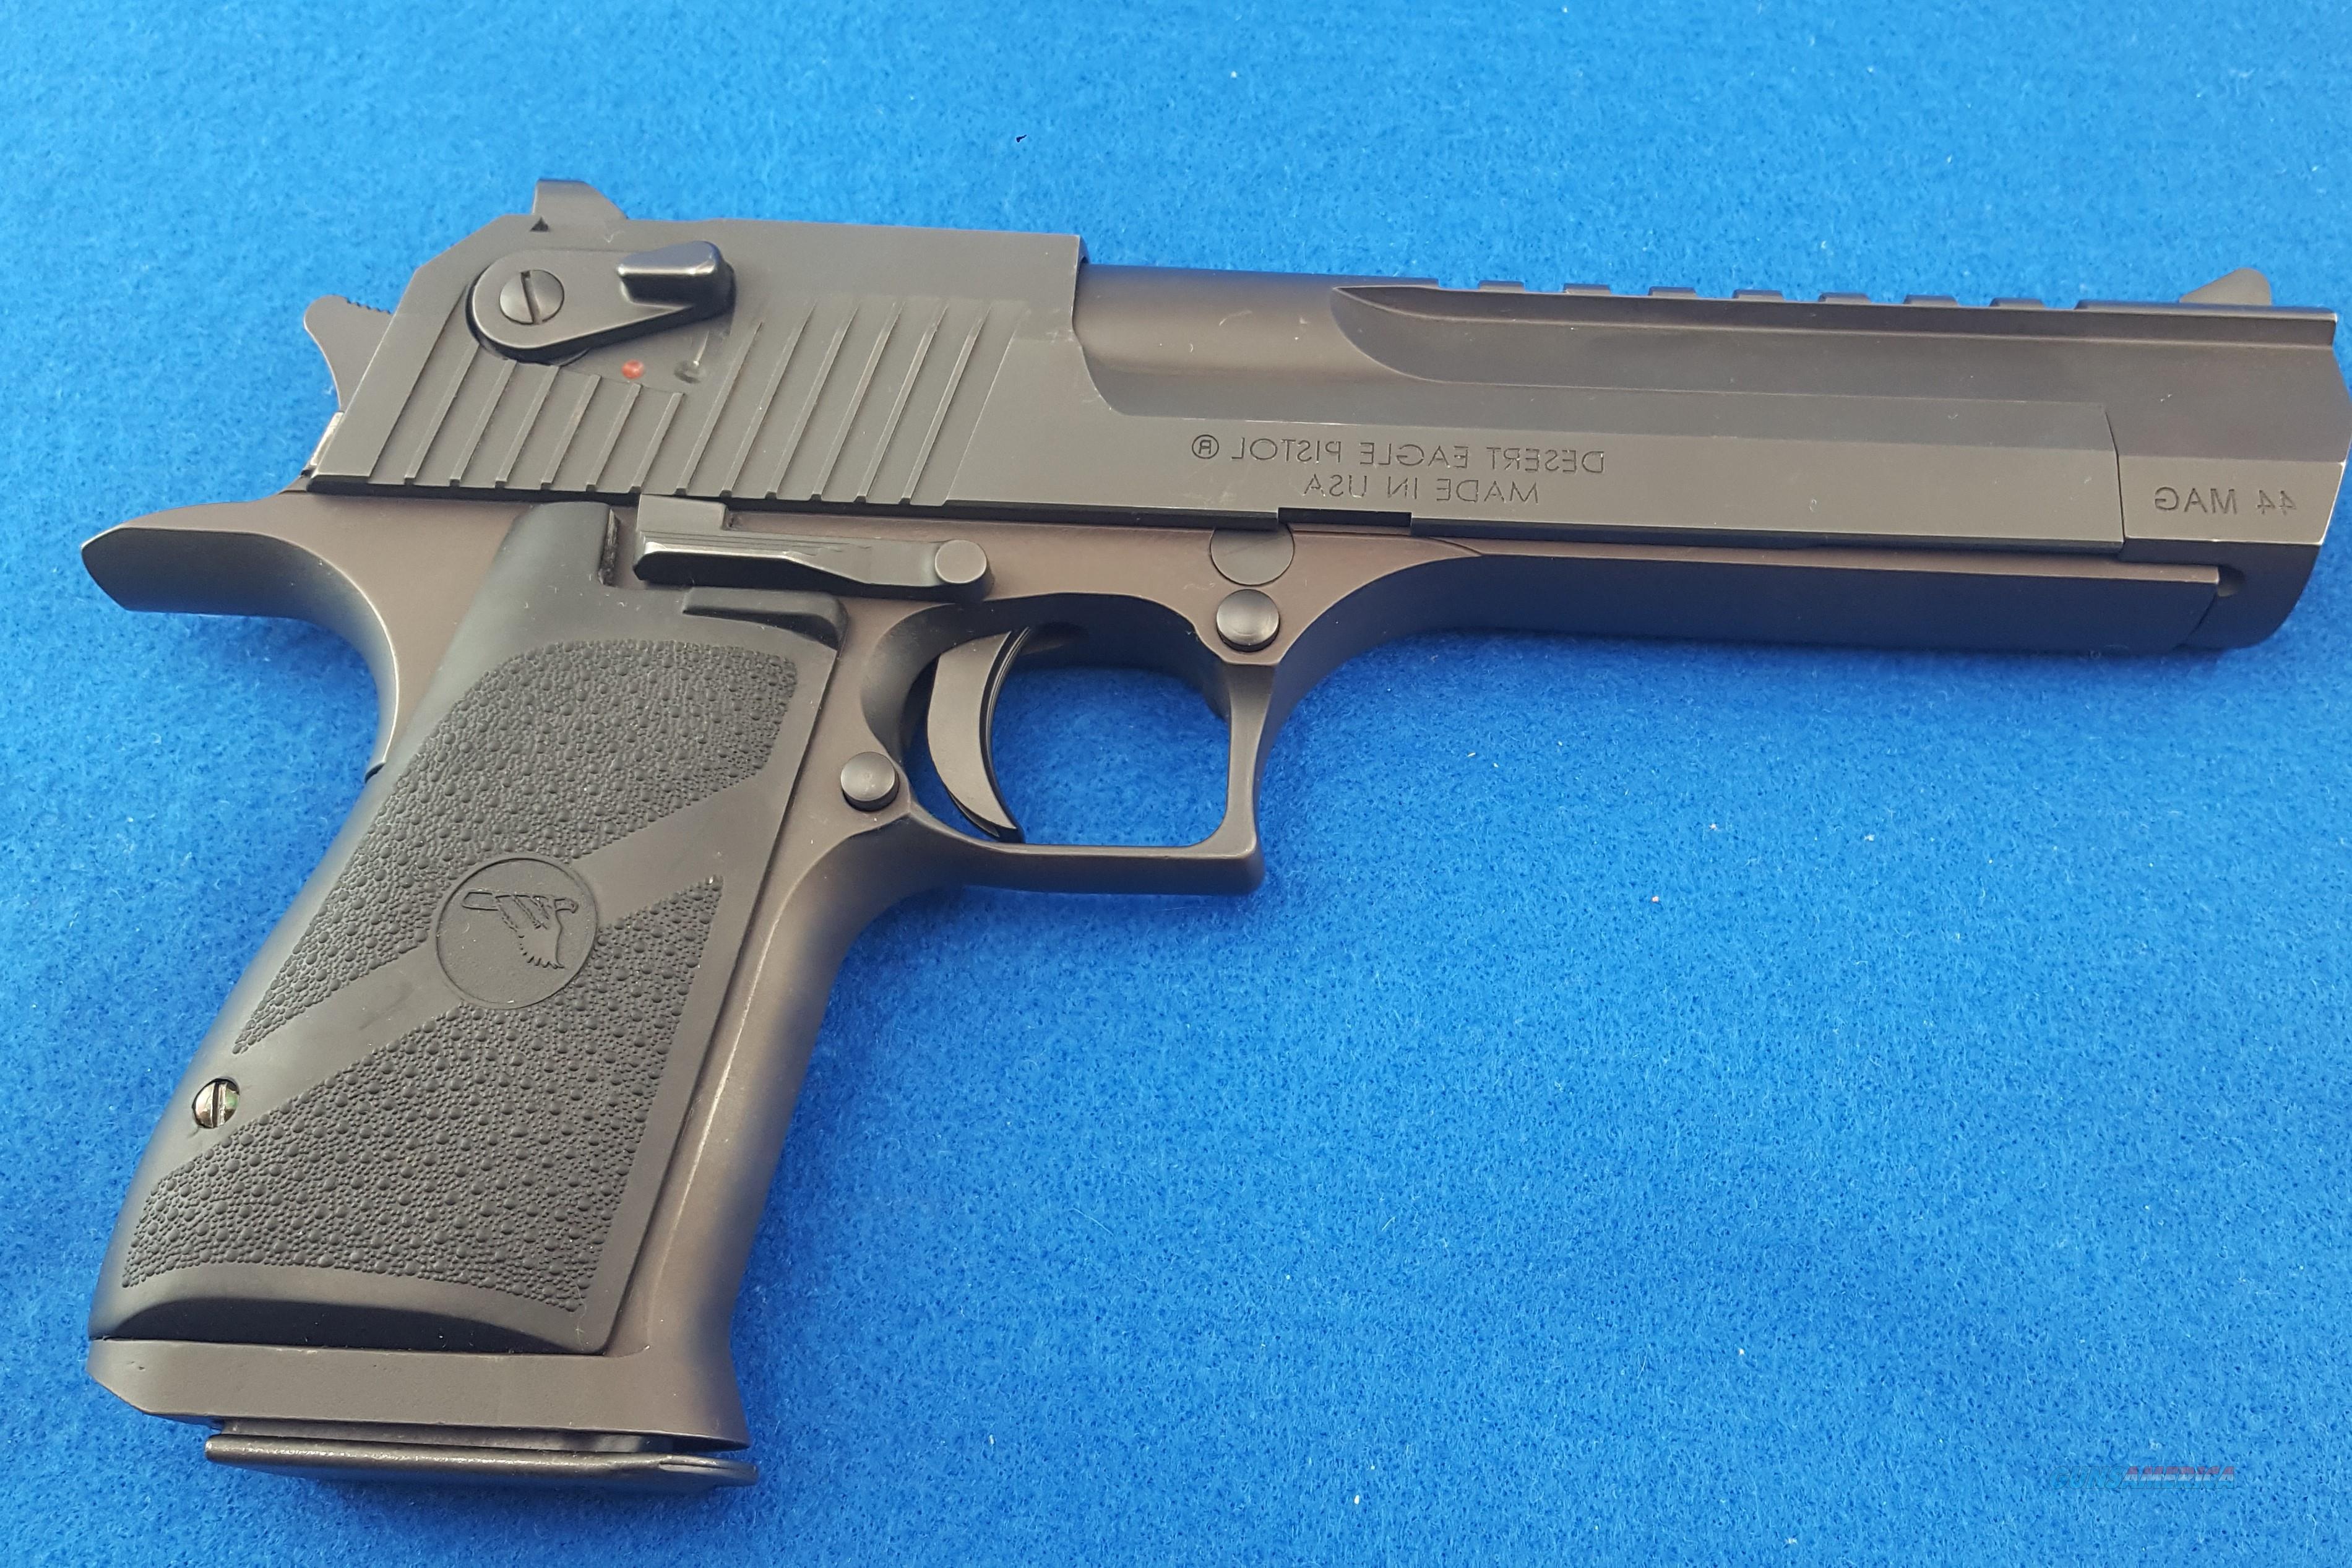 Magnum Research Desert Eagle MK XIX  Guns > Pistols > Desert Eagle/IMI Pistols > Desert Eagle